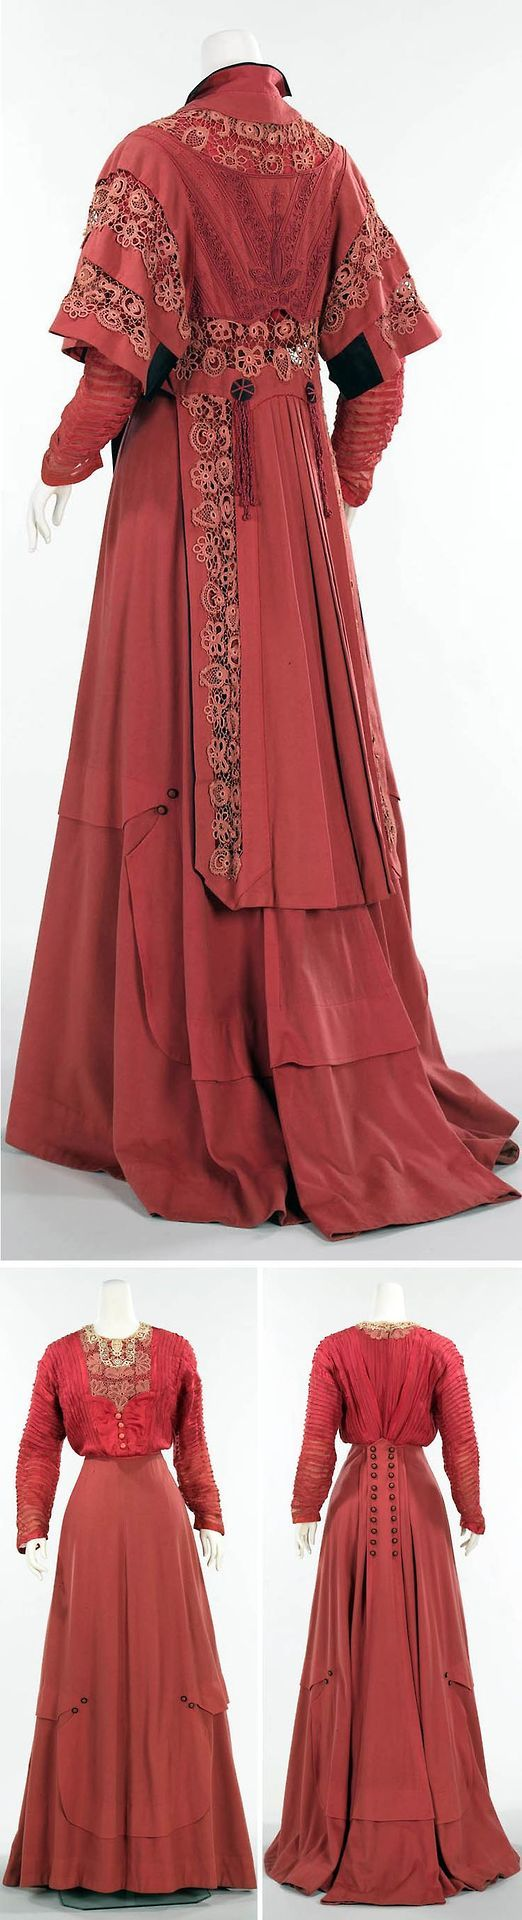 edwardian dress | Tumblr